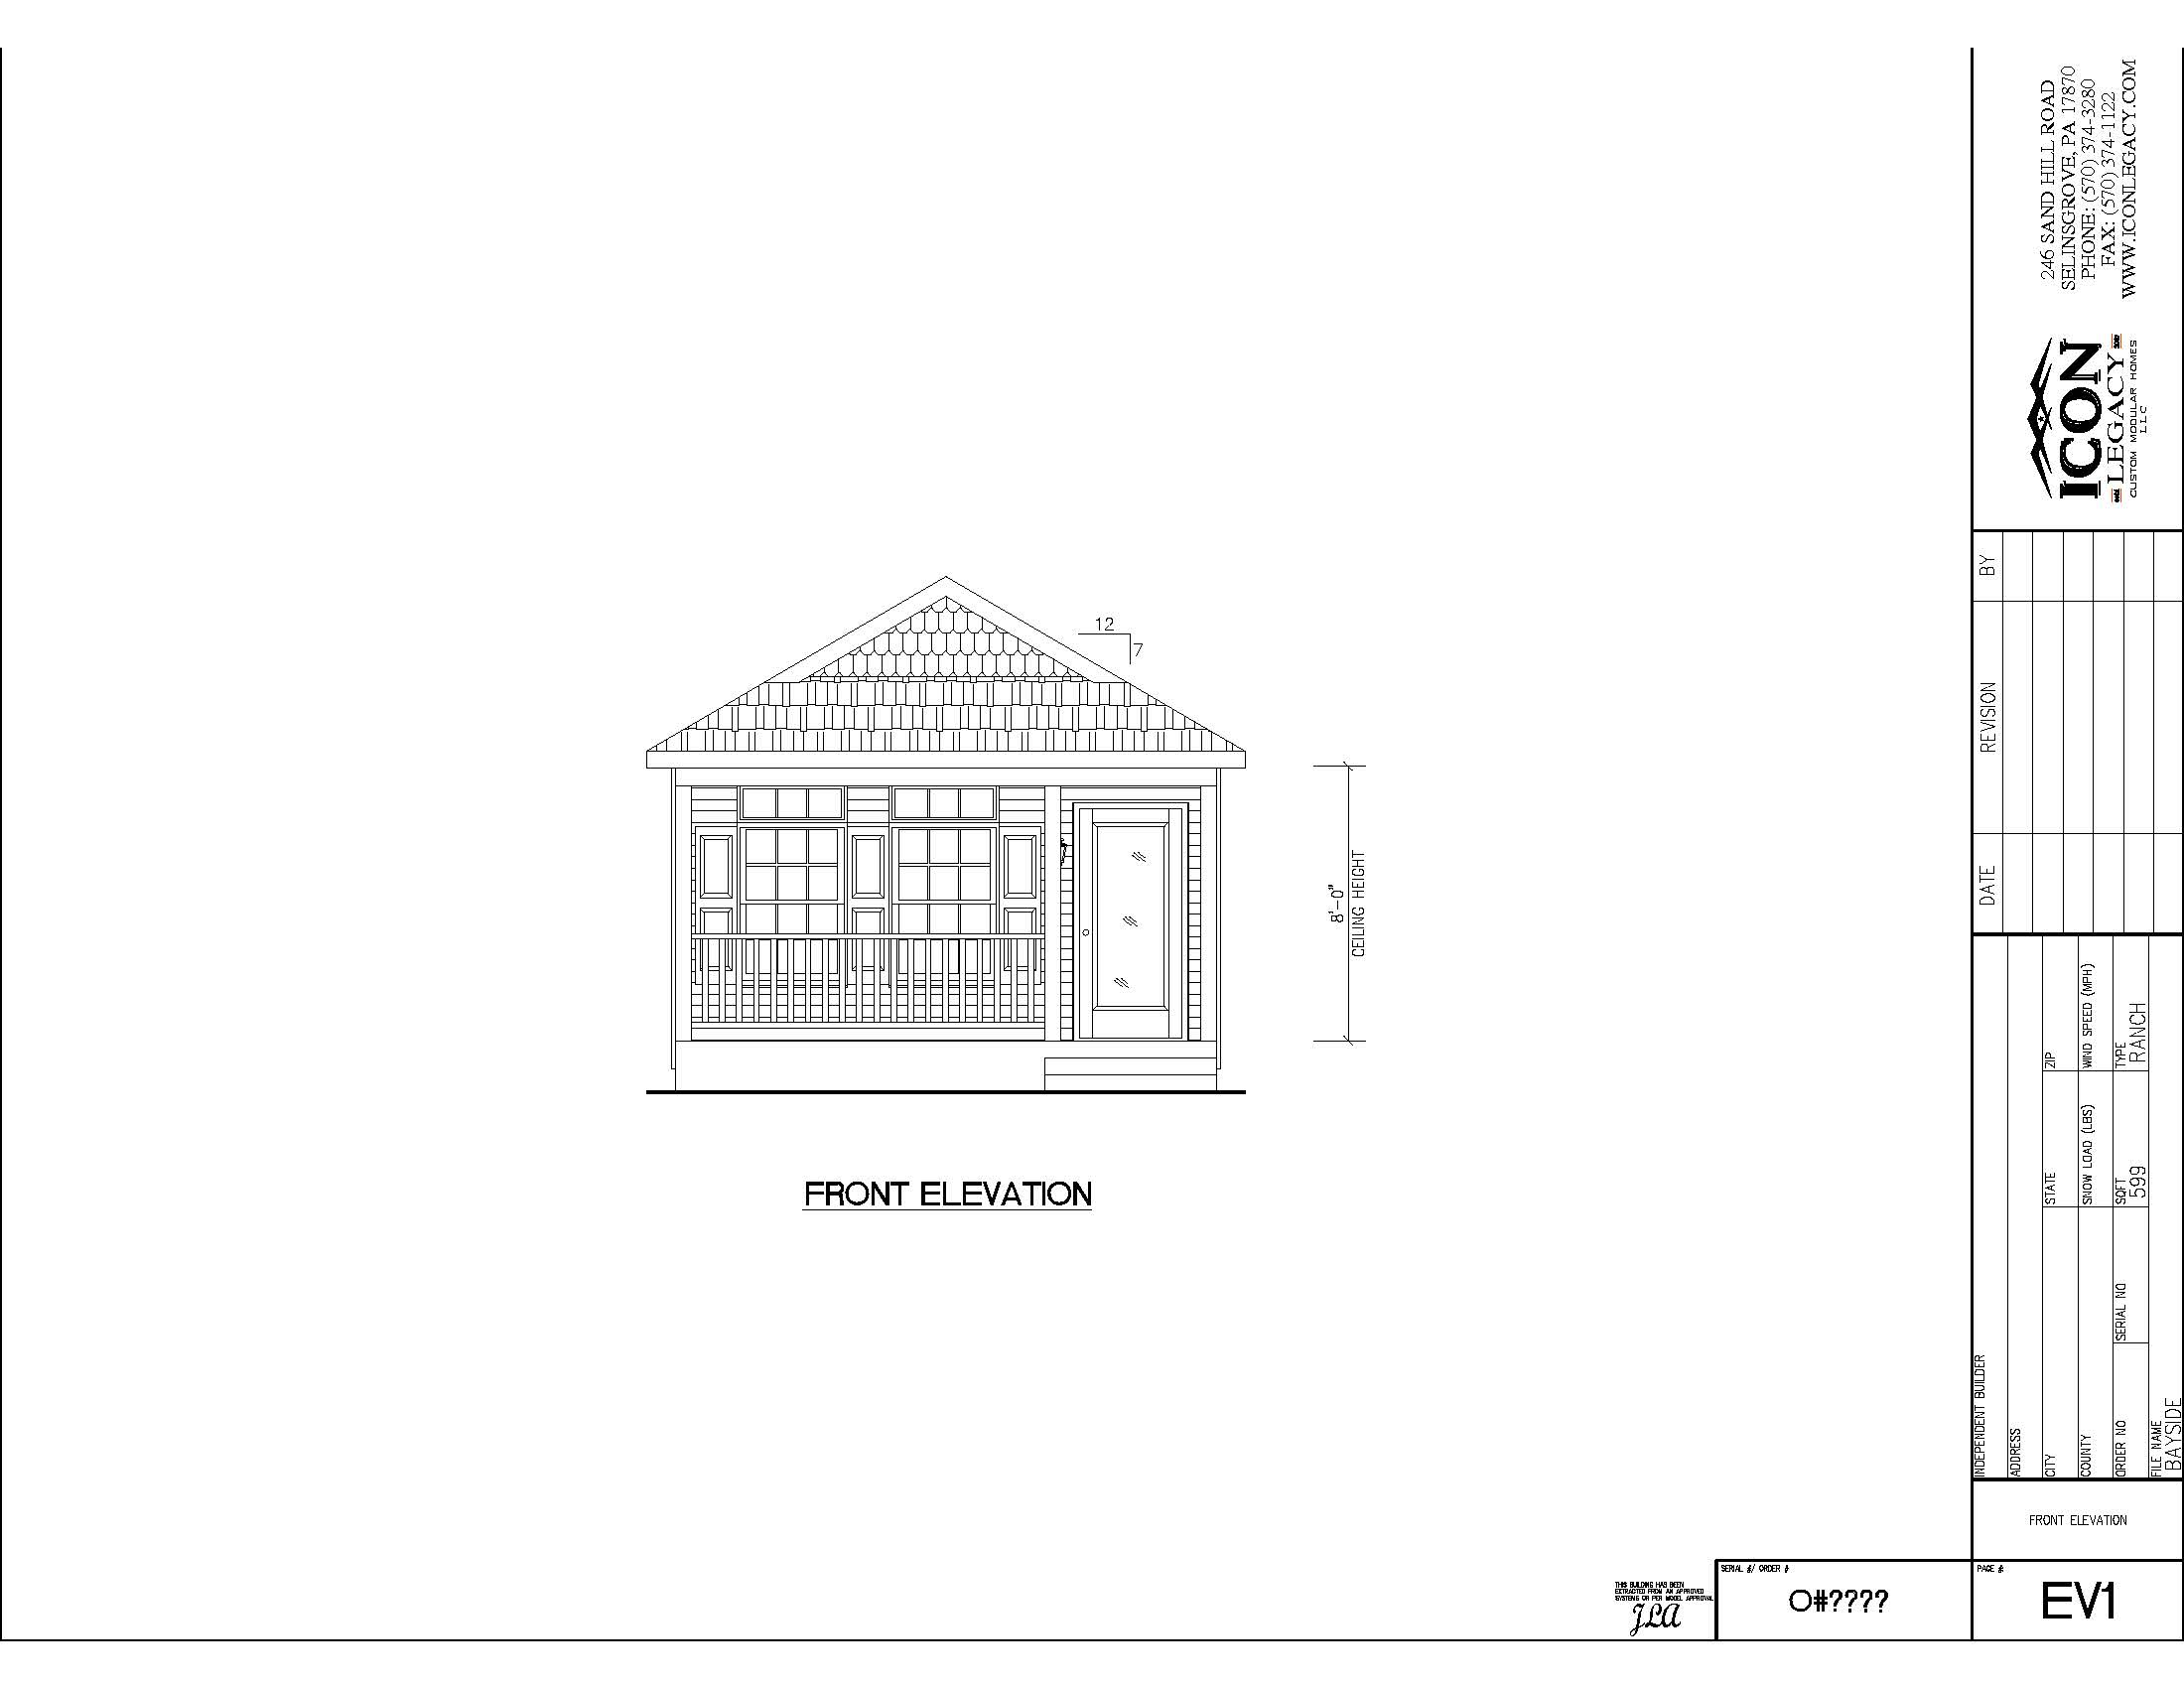 Bayside modular home design